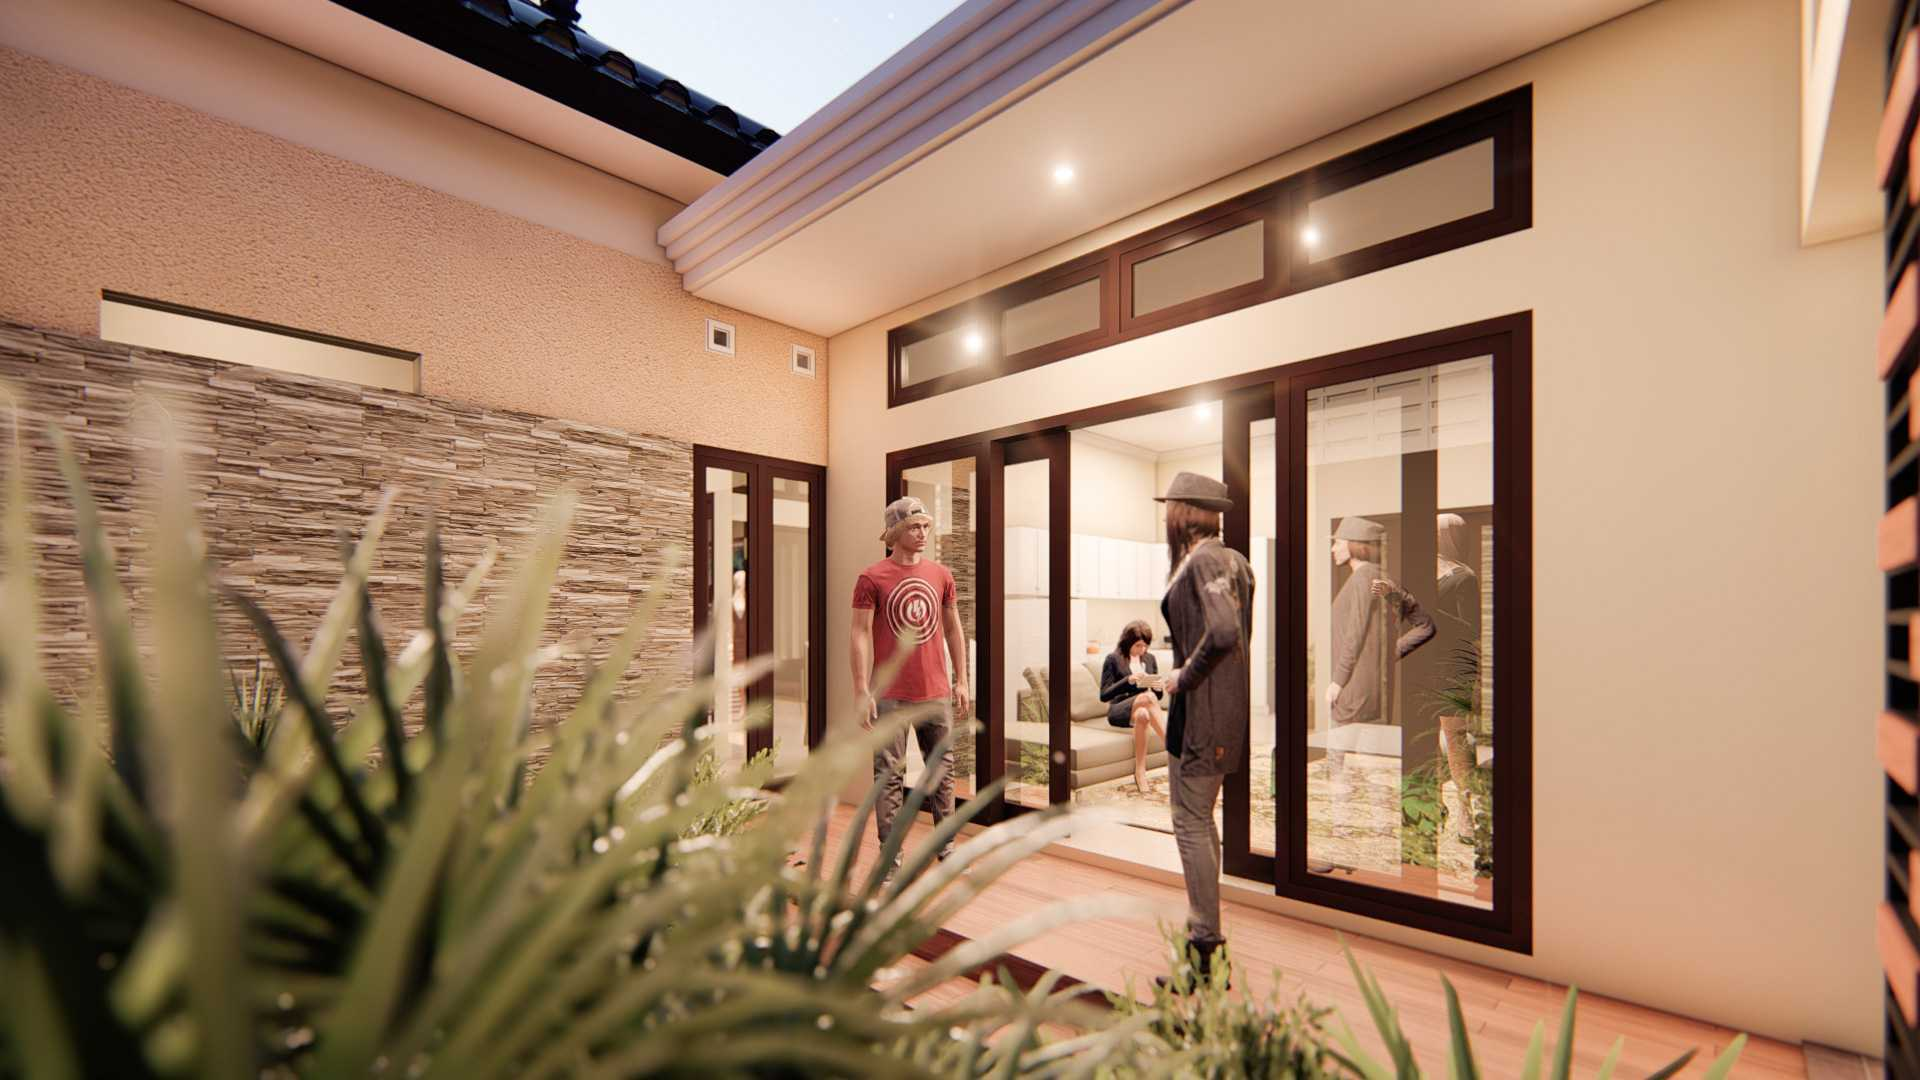 Nggambar Omah   Design And Build The Nusapenida House Blitar, Jawa Timur, Indonesia Blitar, Jawa Timur, Indonesia Nggambar-Omah-Design-And-Build-The-Nusapenida-House  75674